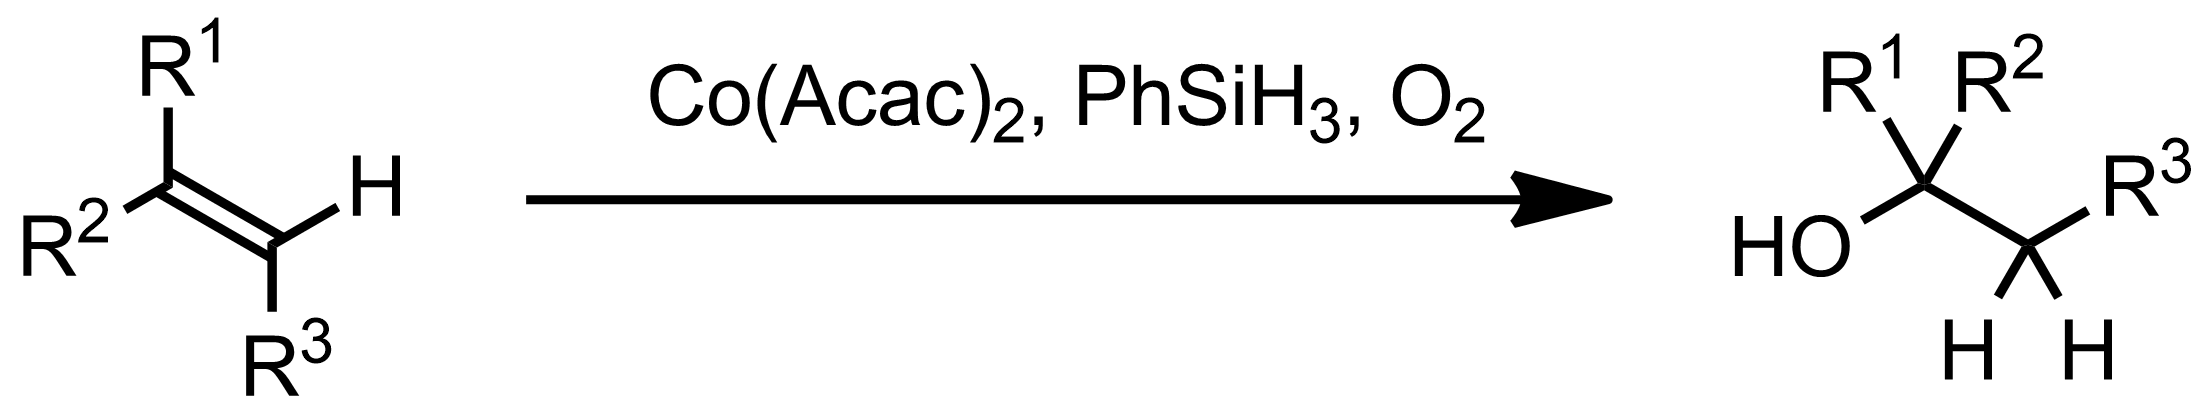 Schematic representation of the Mukaiyama Hydration.